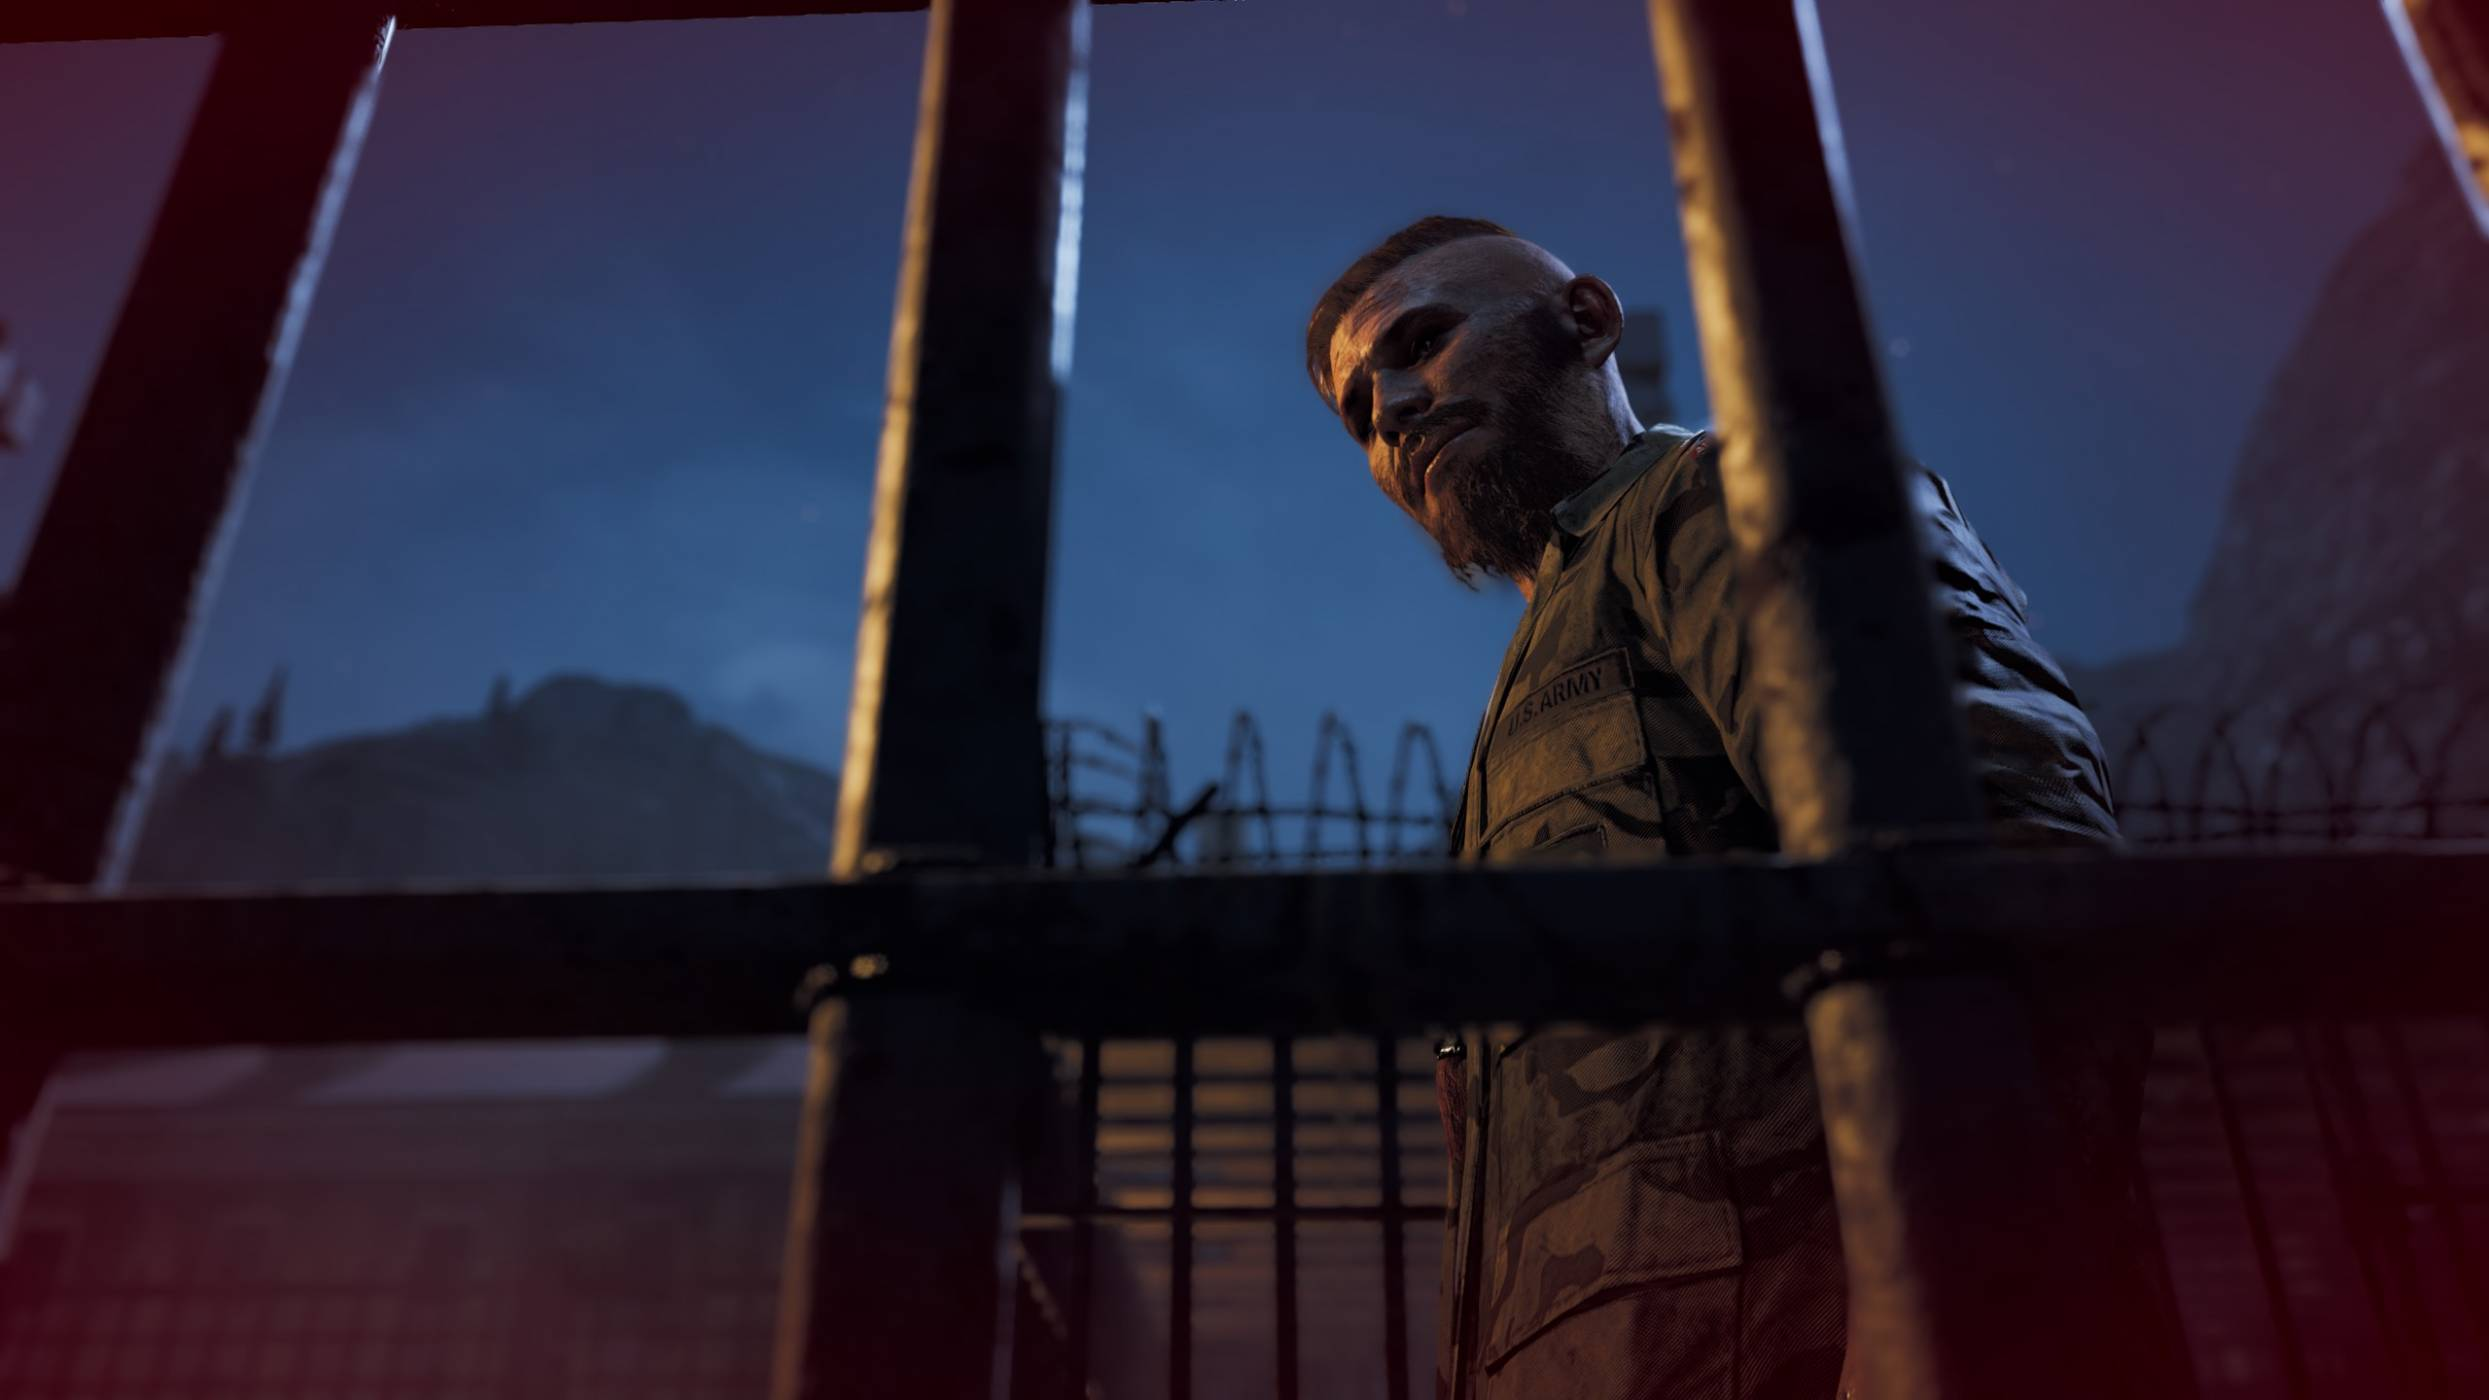 Far Cry 5: към Монтана с престрелки, пикапи и Чийзбургер (ревю)